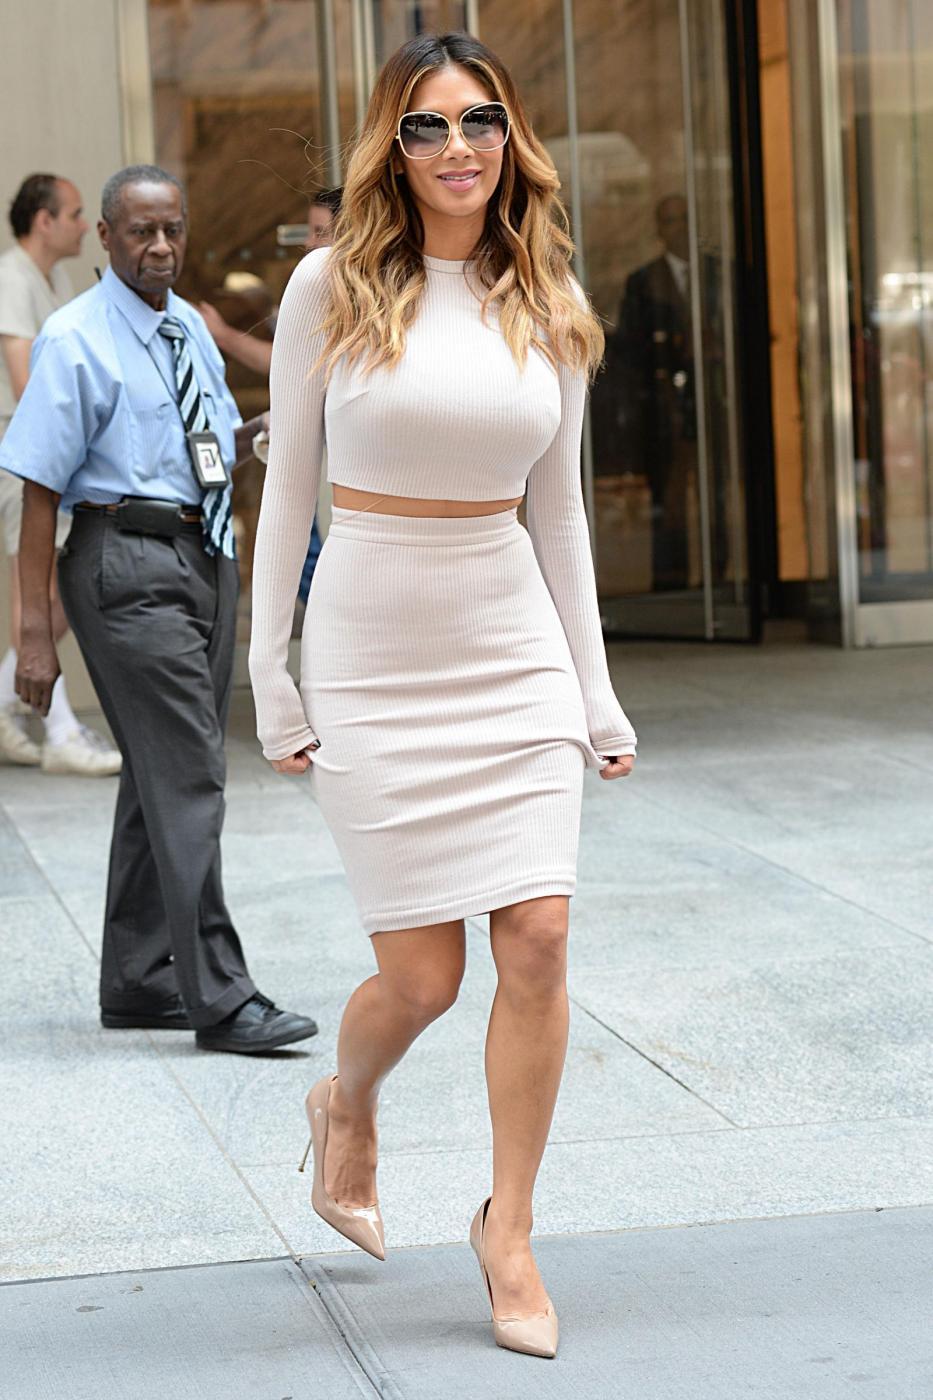 Nicole Scherzinger sempre più curvy e...bionda. Abiti super aderenti a New York FOTO 21